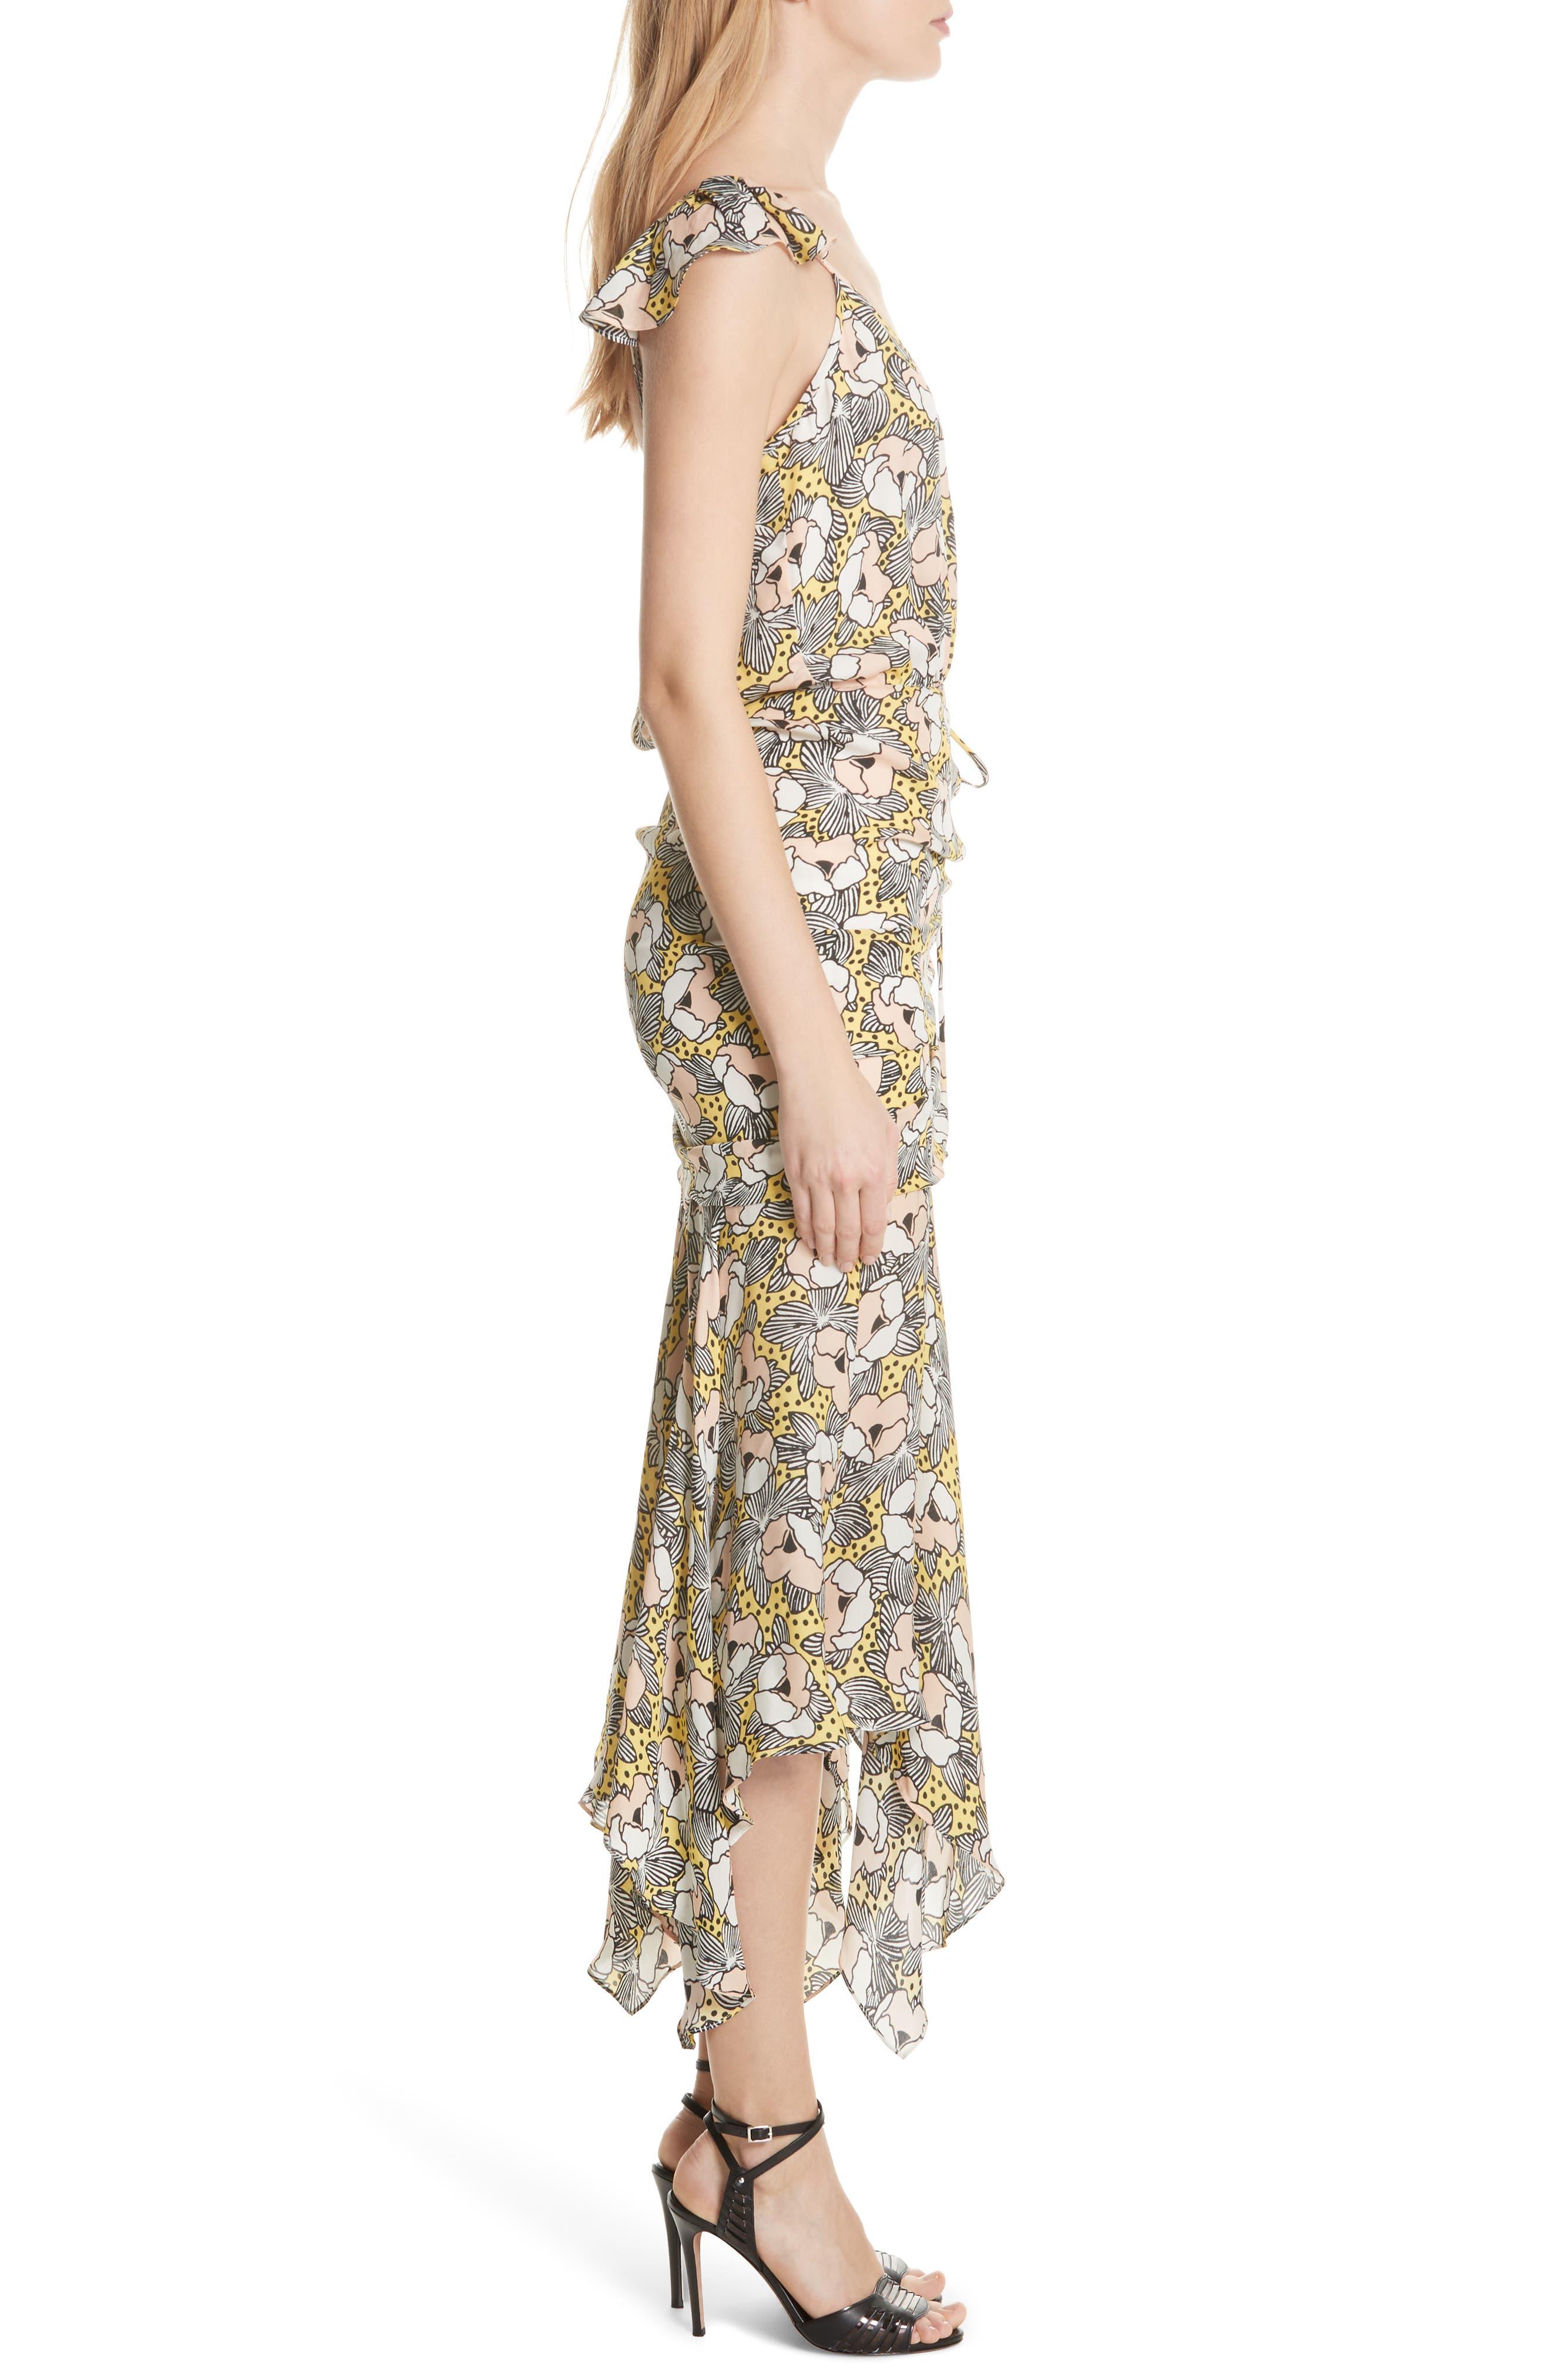 Martine Floral Print Dress,                             Alternate thumbnail 5, color,